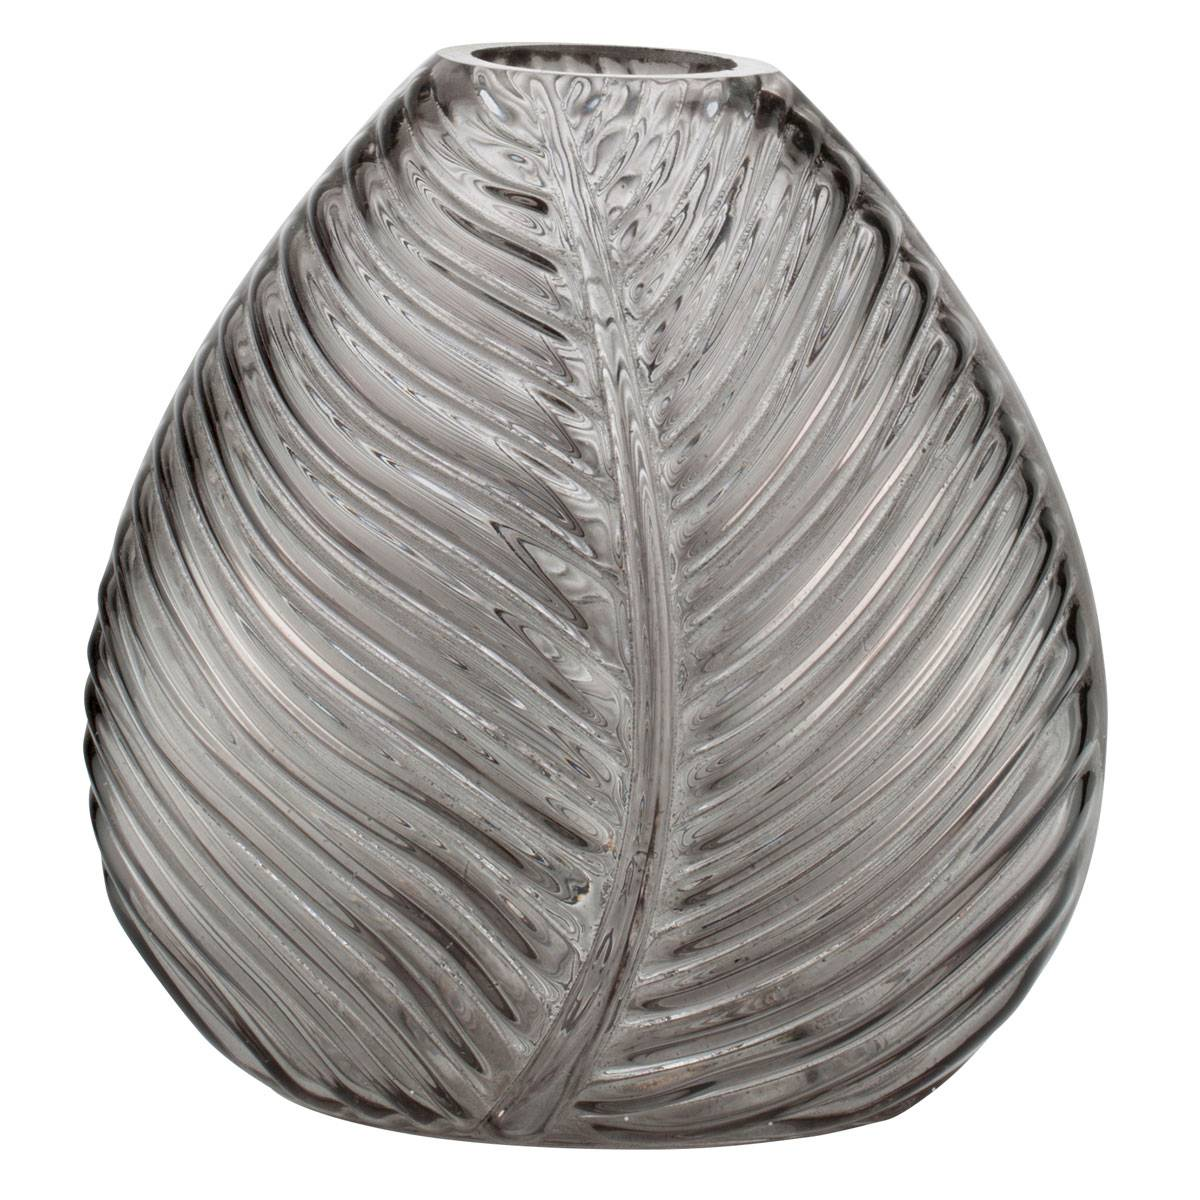 Lene Bjerre Misa Vase 13 cm, Peat